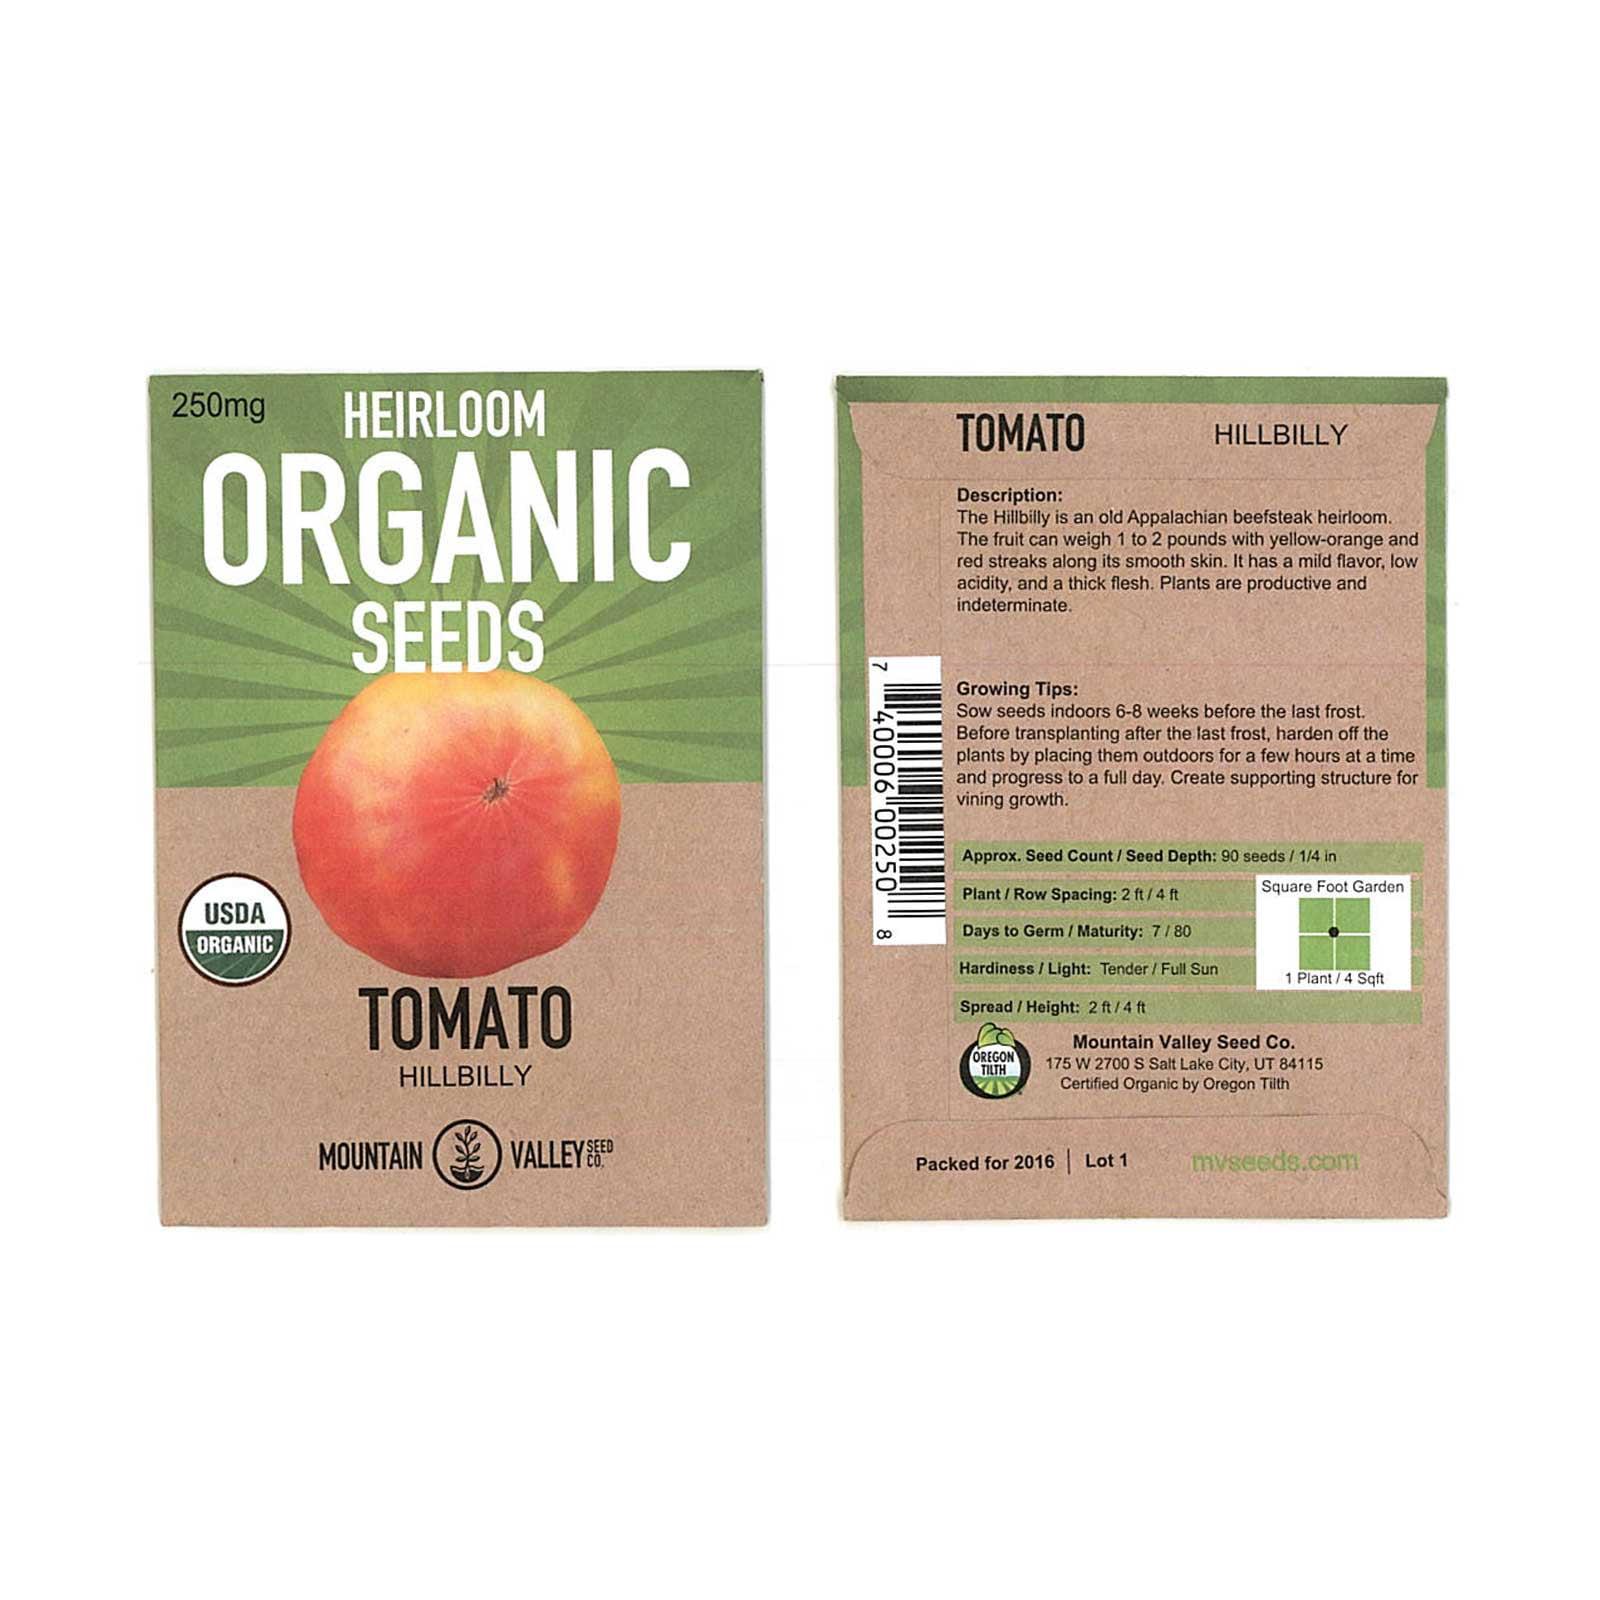 Tomato Garden Seeds Yellow Pear 250 mg Packet NonGMO Organic